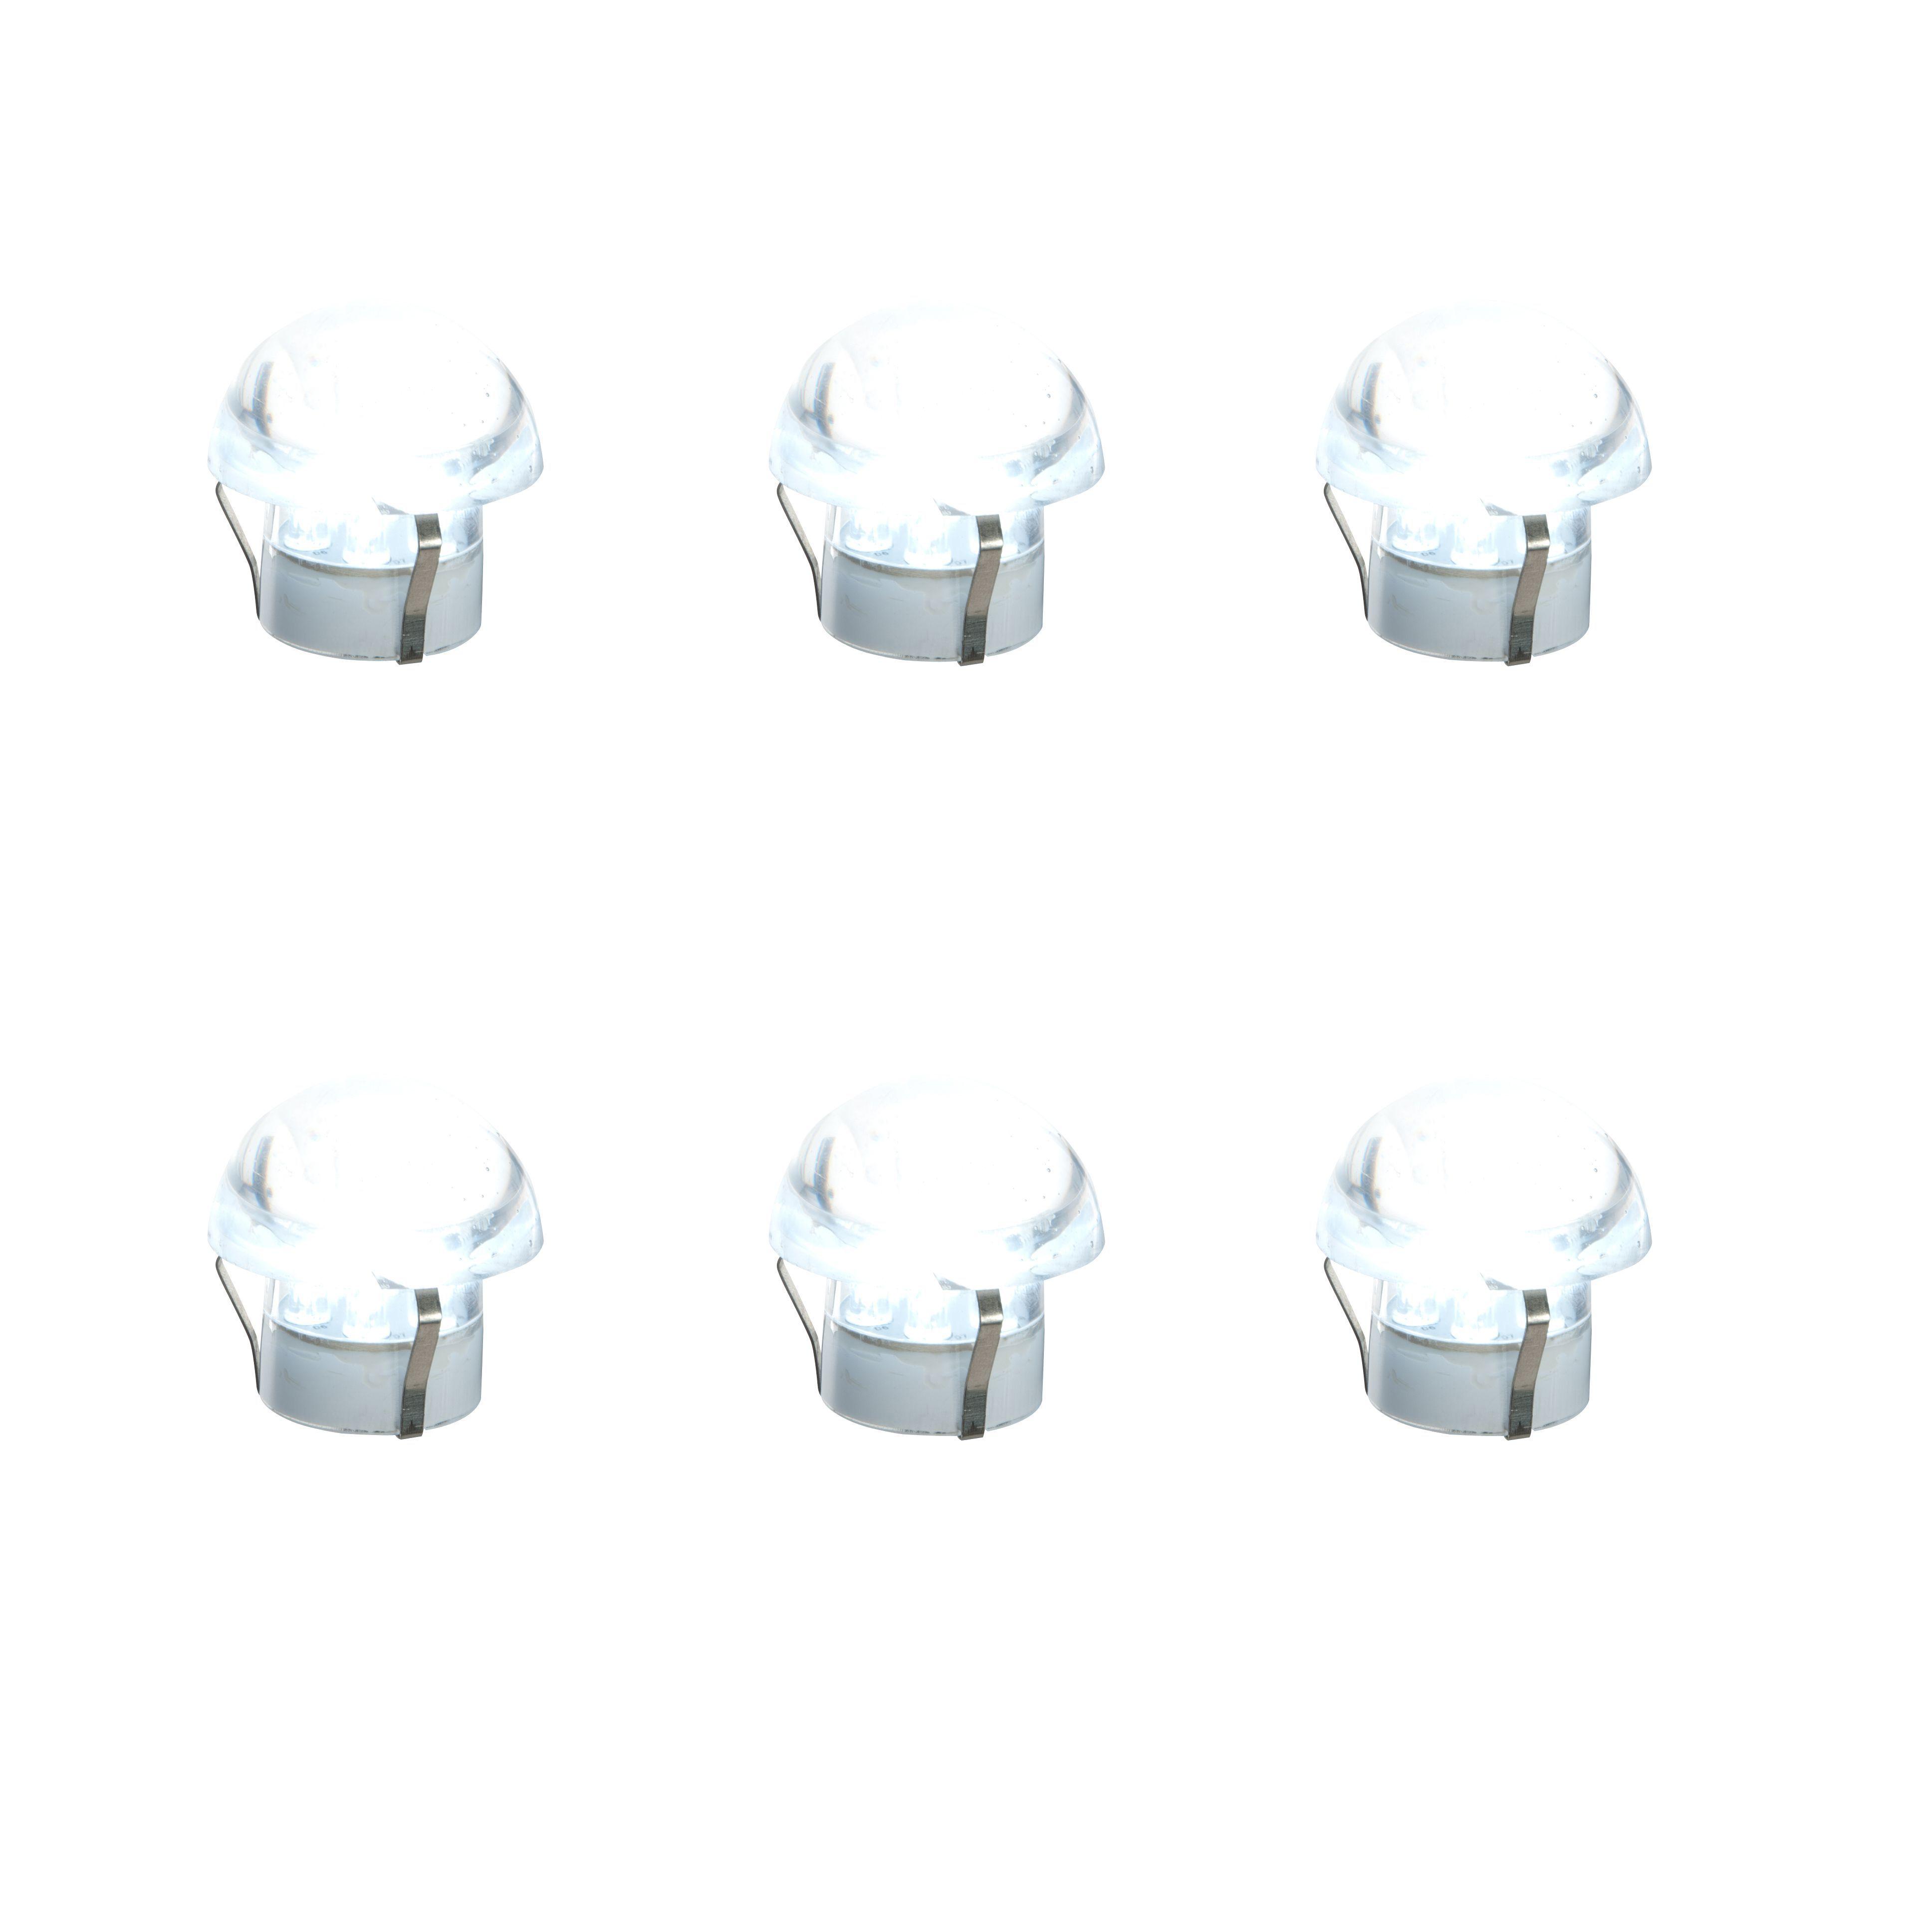 Masterlite Mains Powered Led Cabinet Light, Pack Of 6